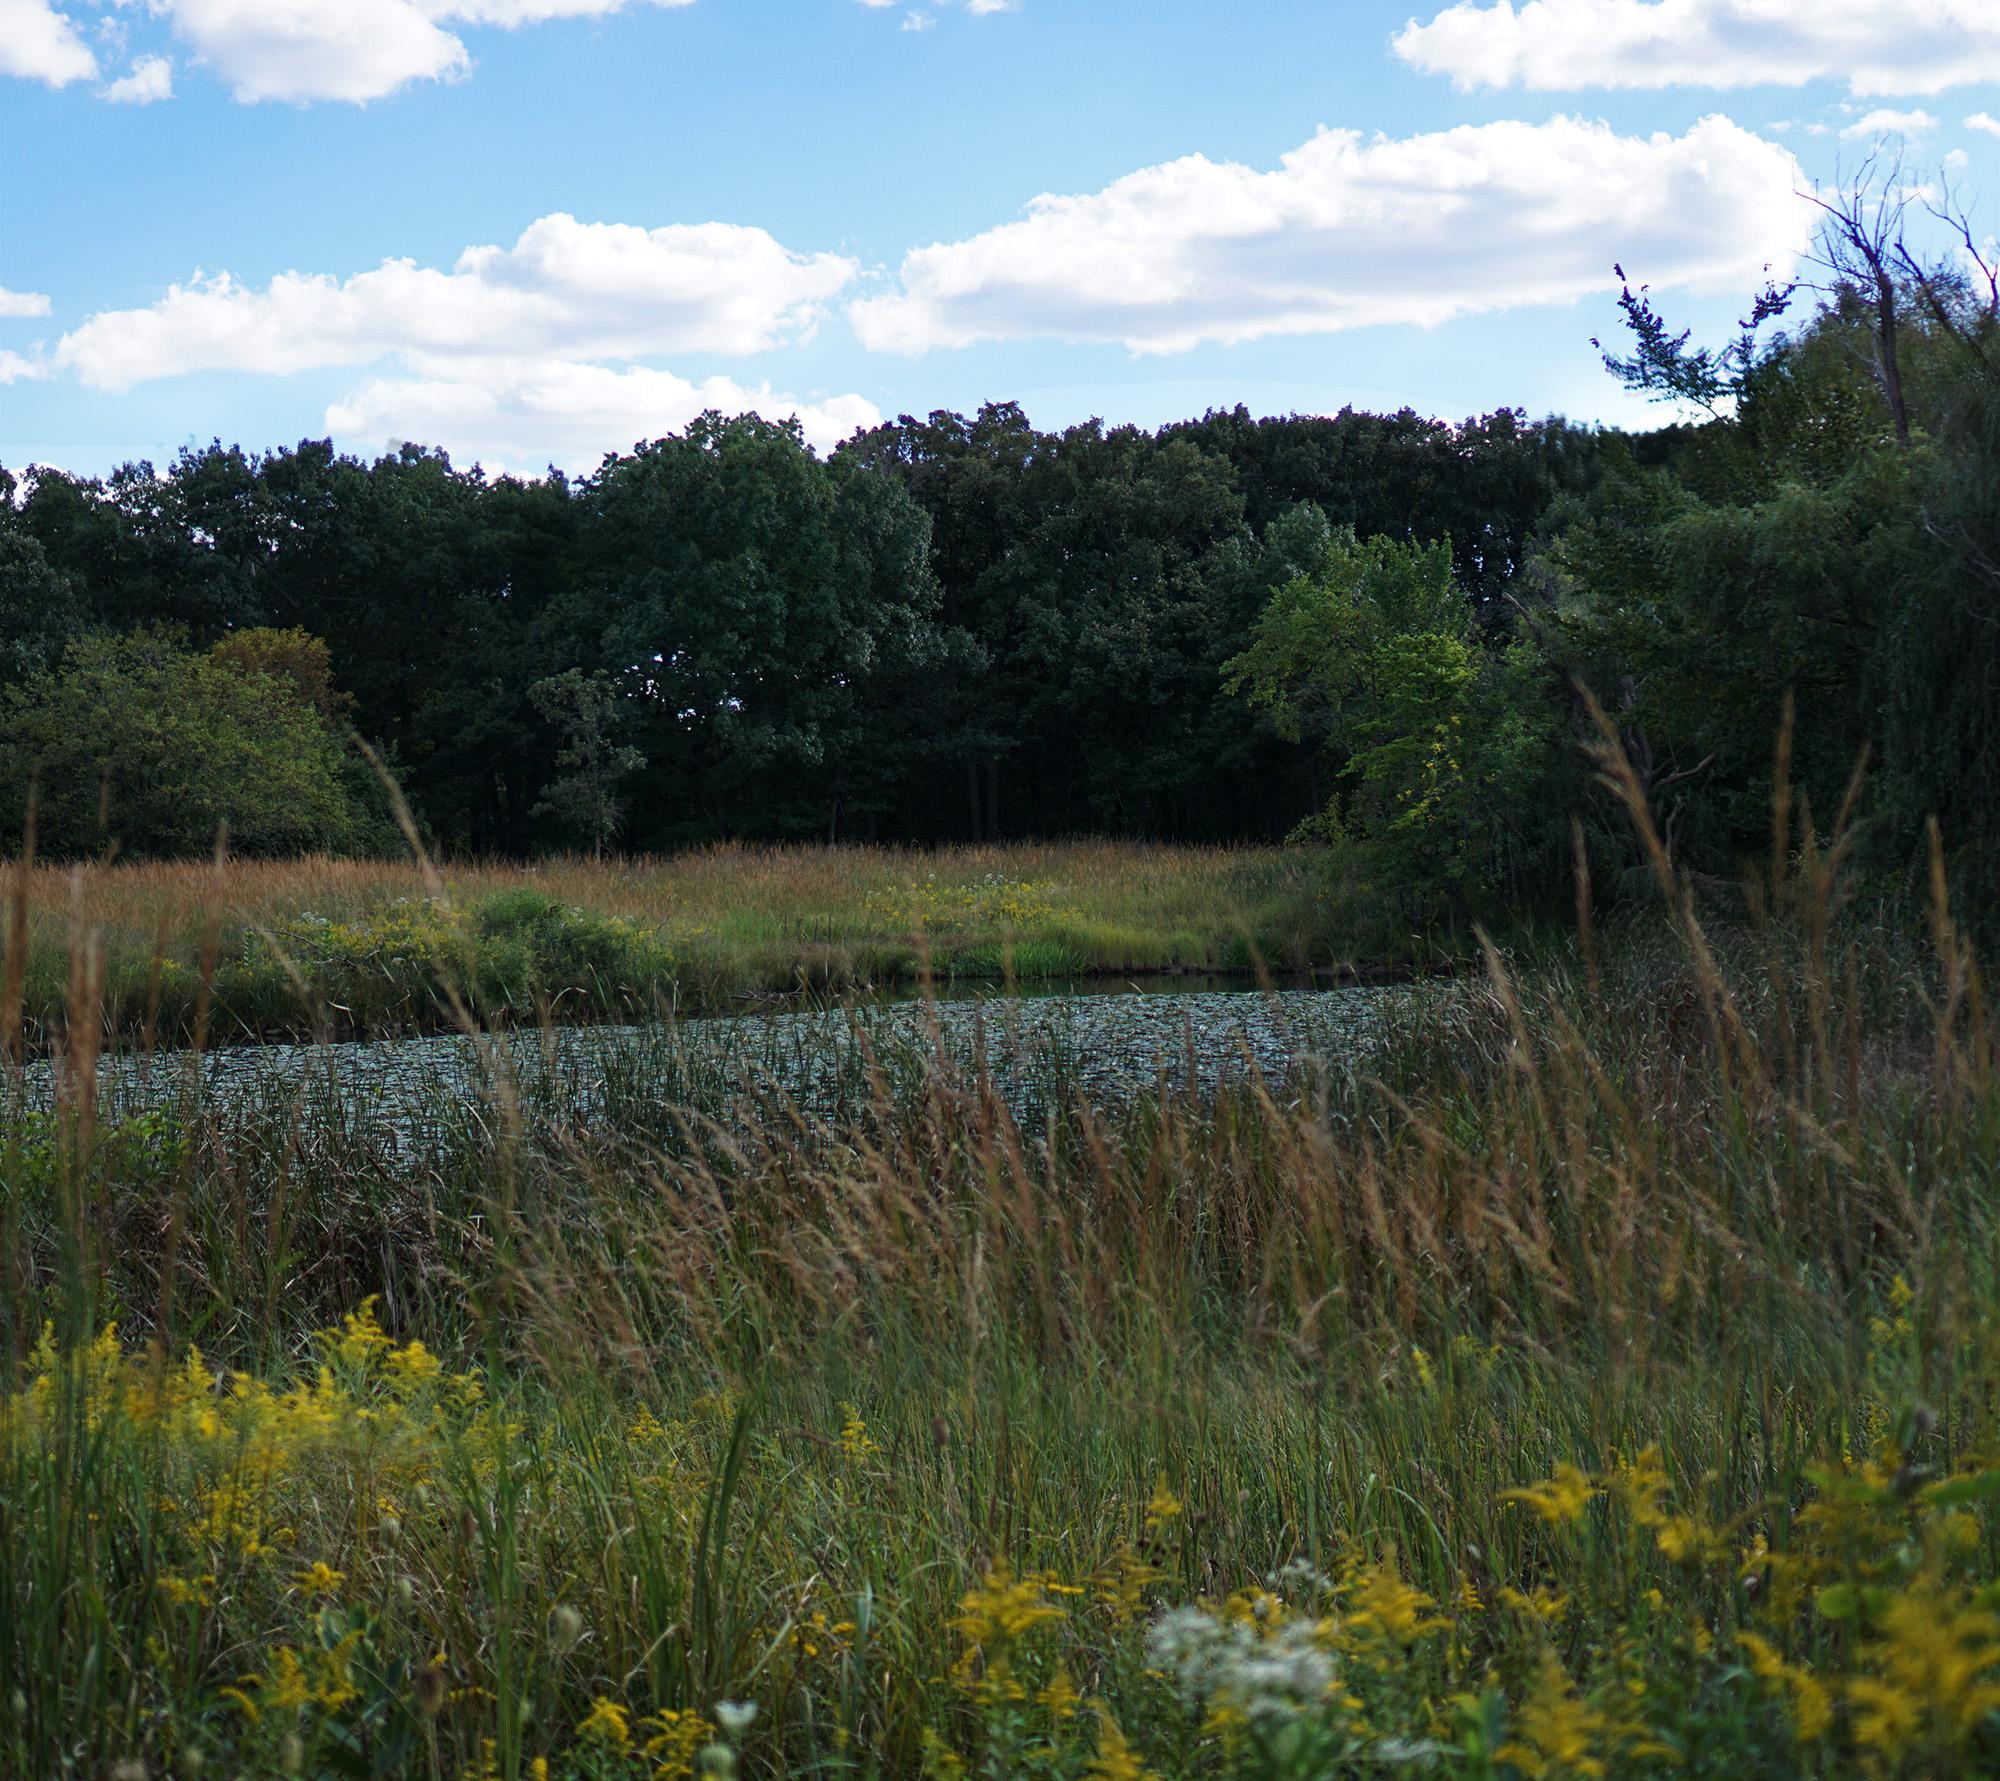 north-park-village-nature-center-1223